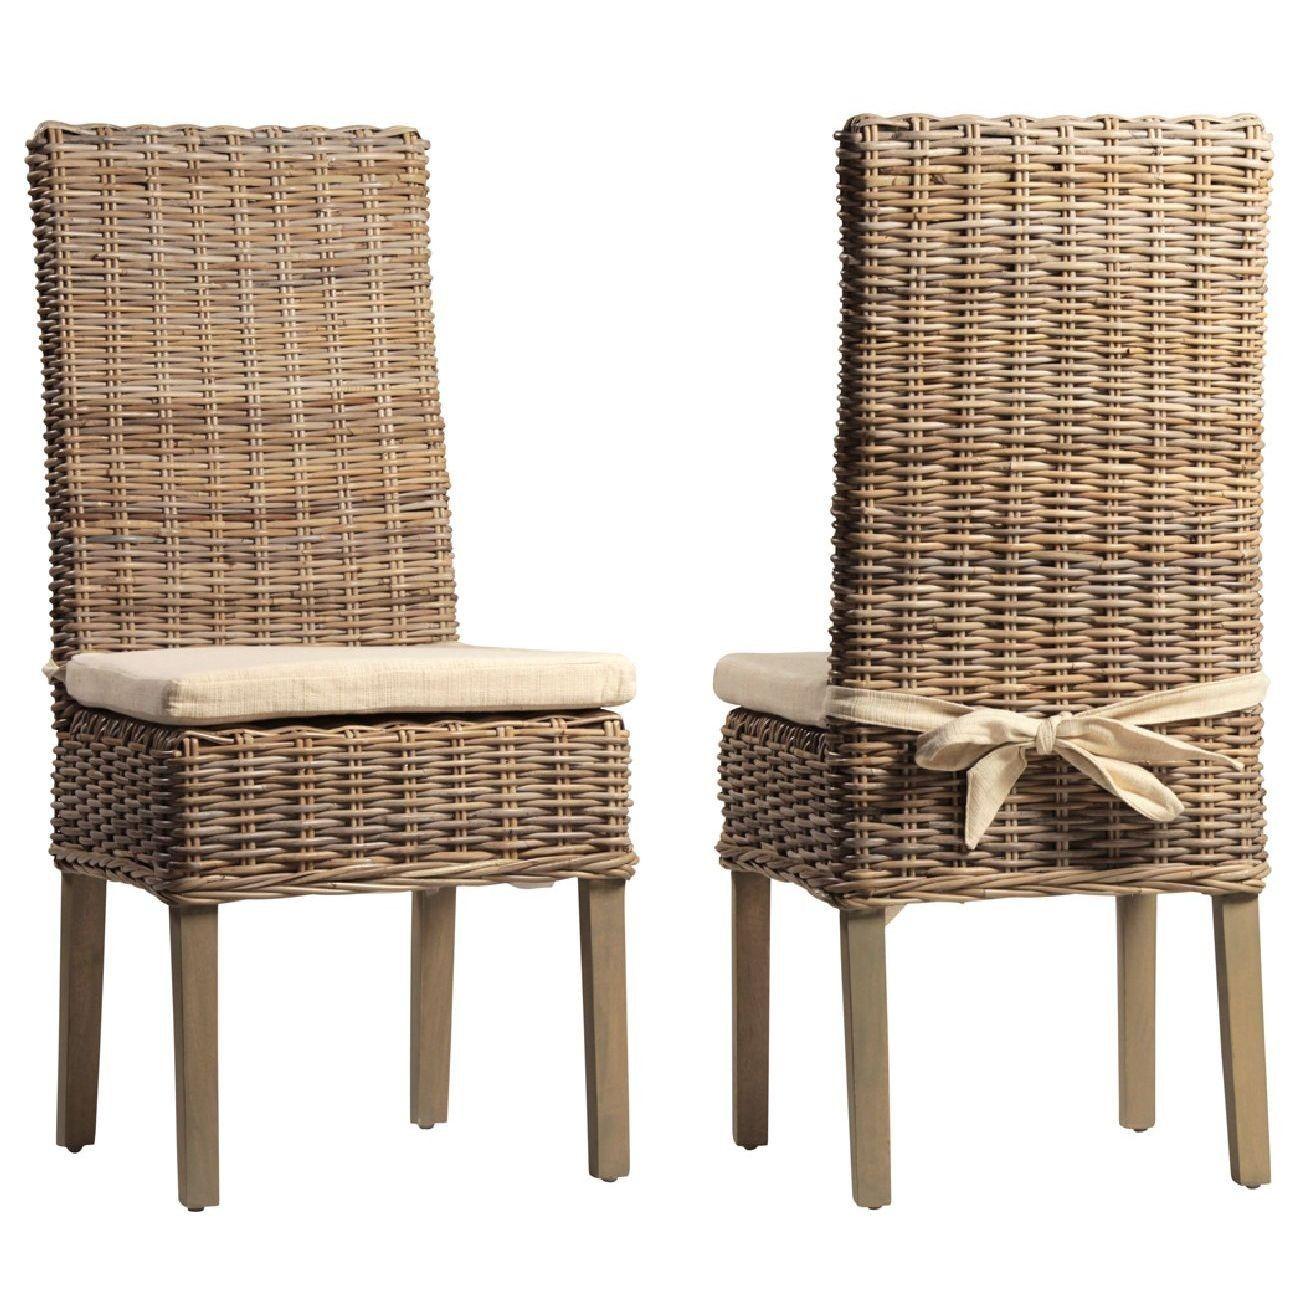 Dovetail Kubu Dining Chair Rattan Dining Chairs Dining Chairs Dining Chair Set